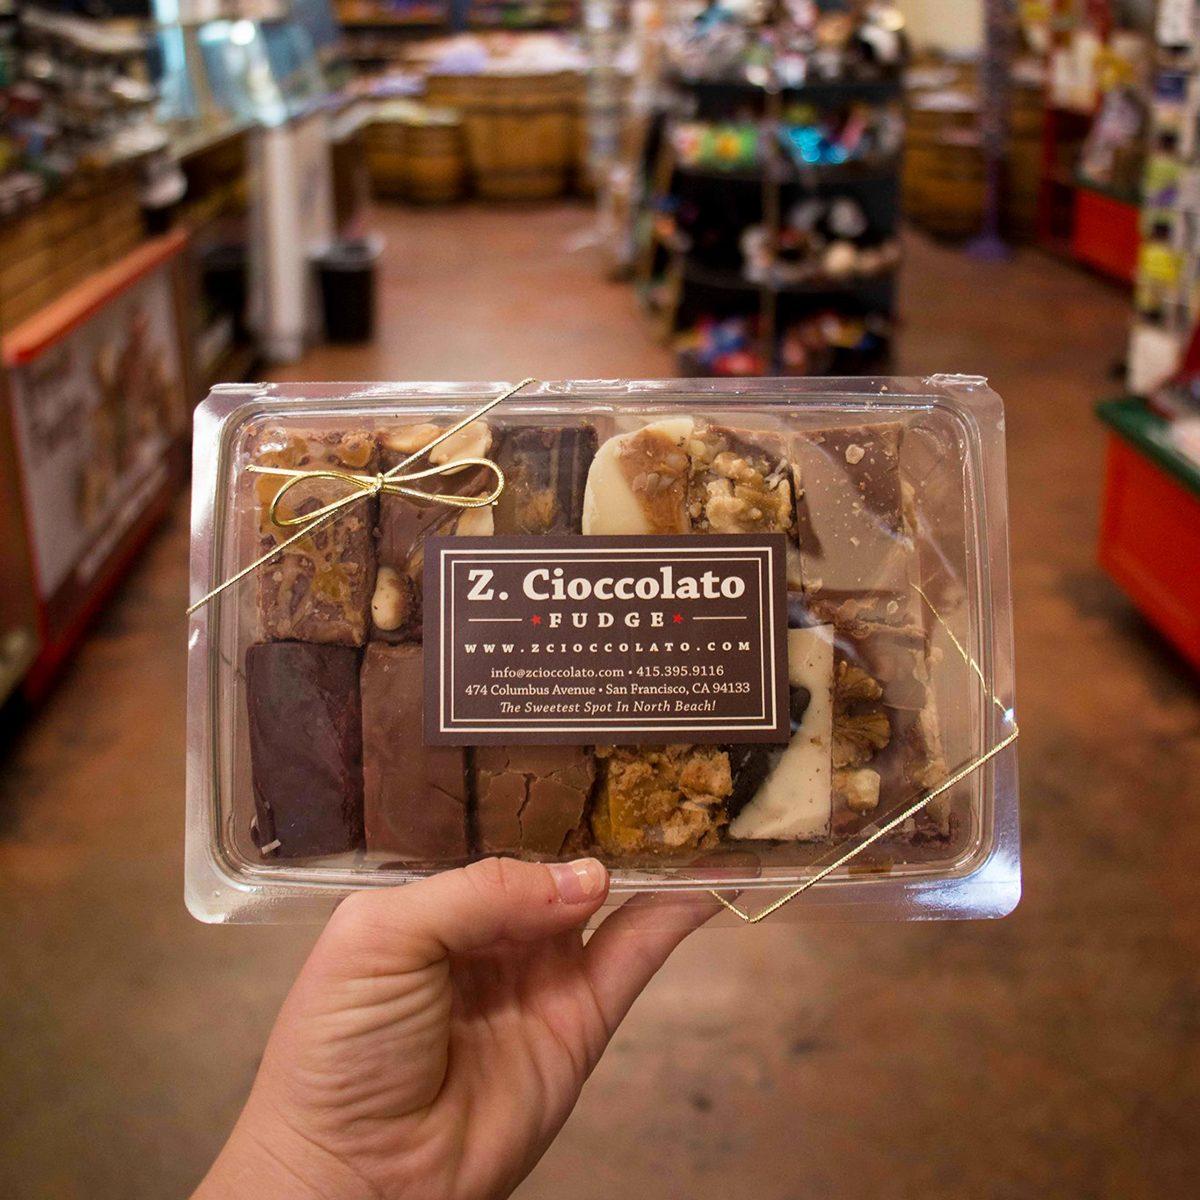 Best Fudge Shop in California - Z. Cioccolato Fudge